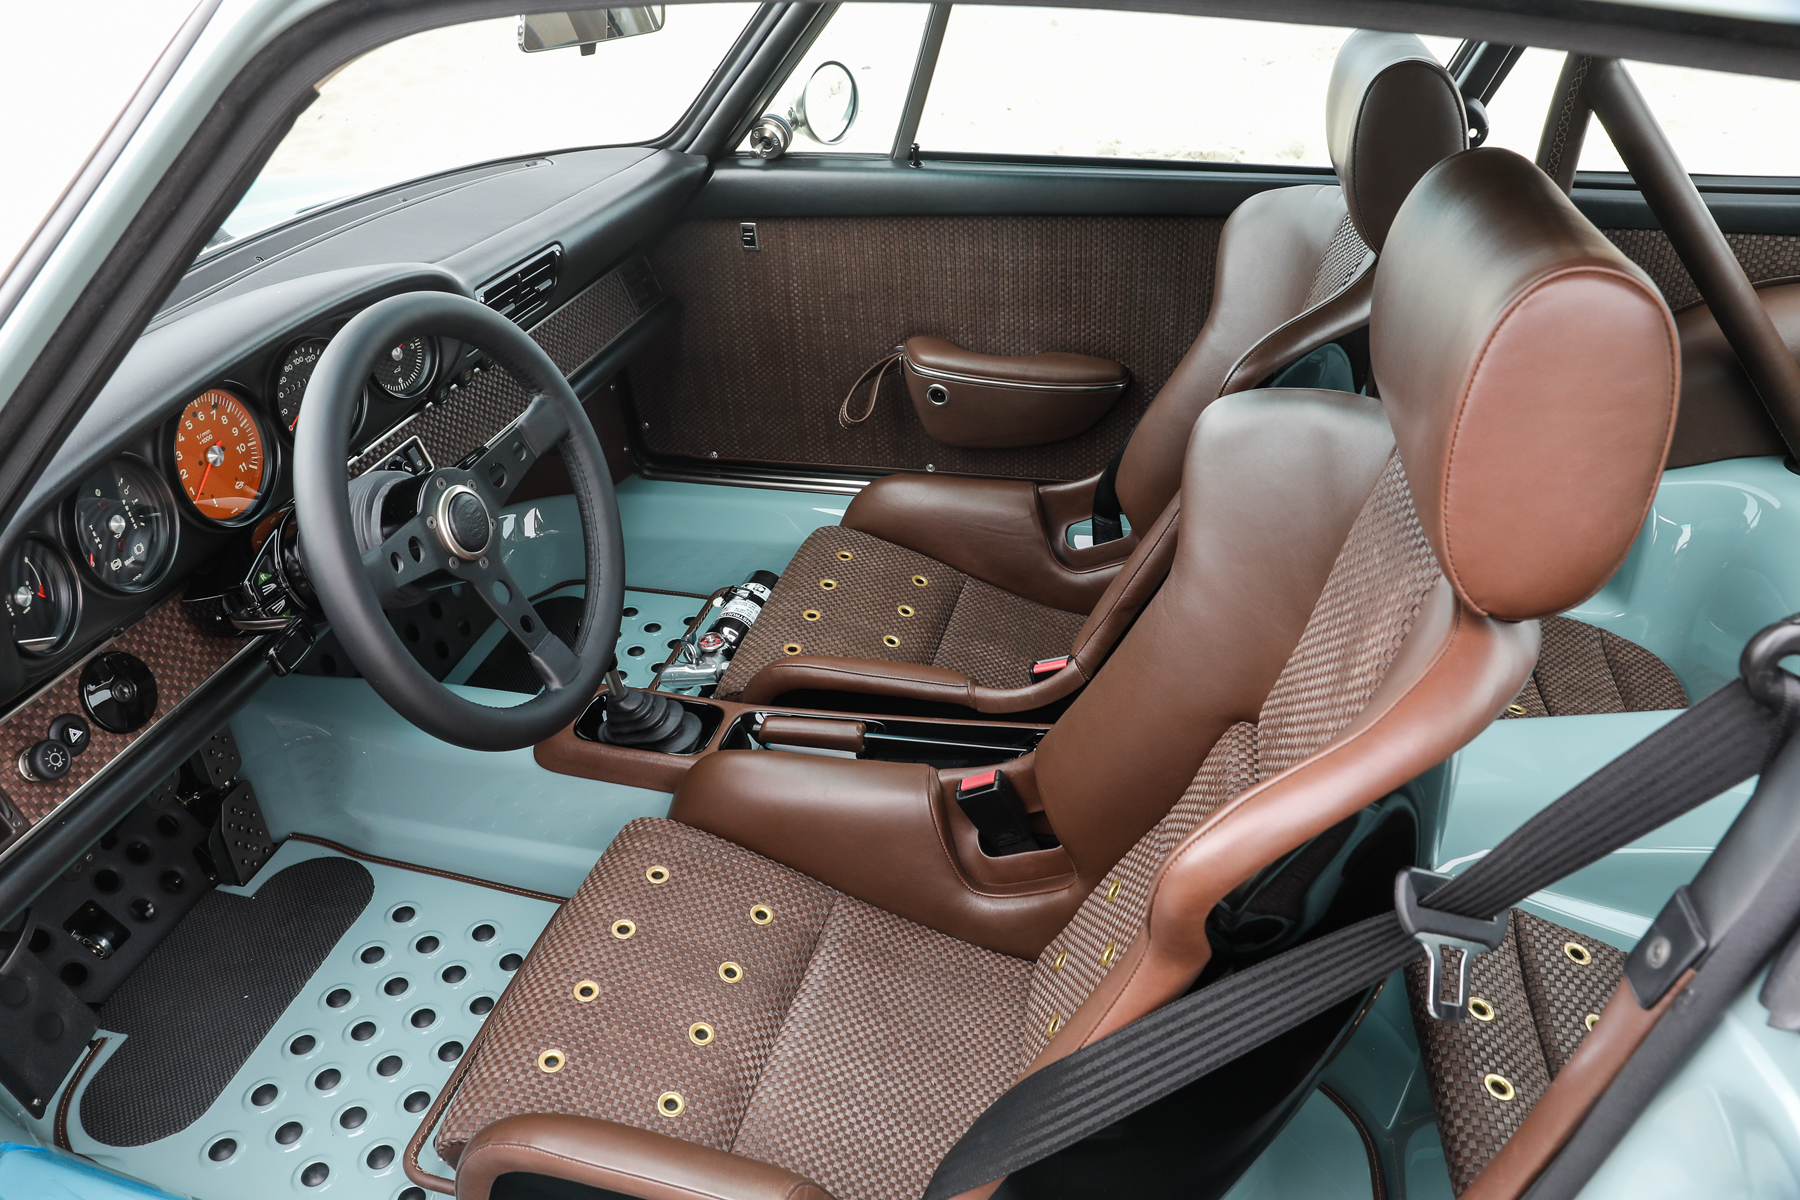 1991_Porsche_911_Singer_Rust_and_Glory_5